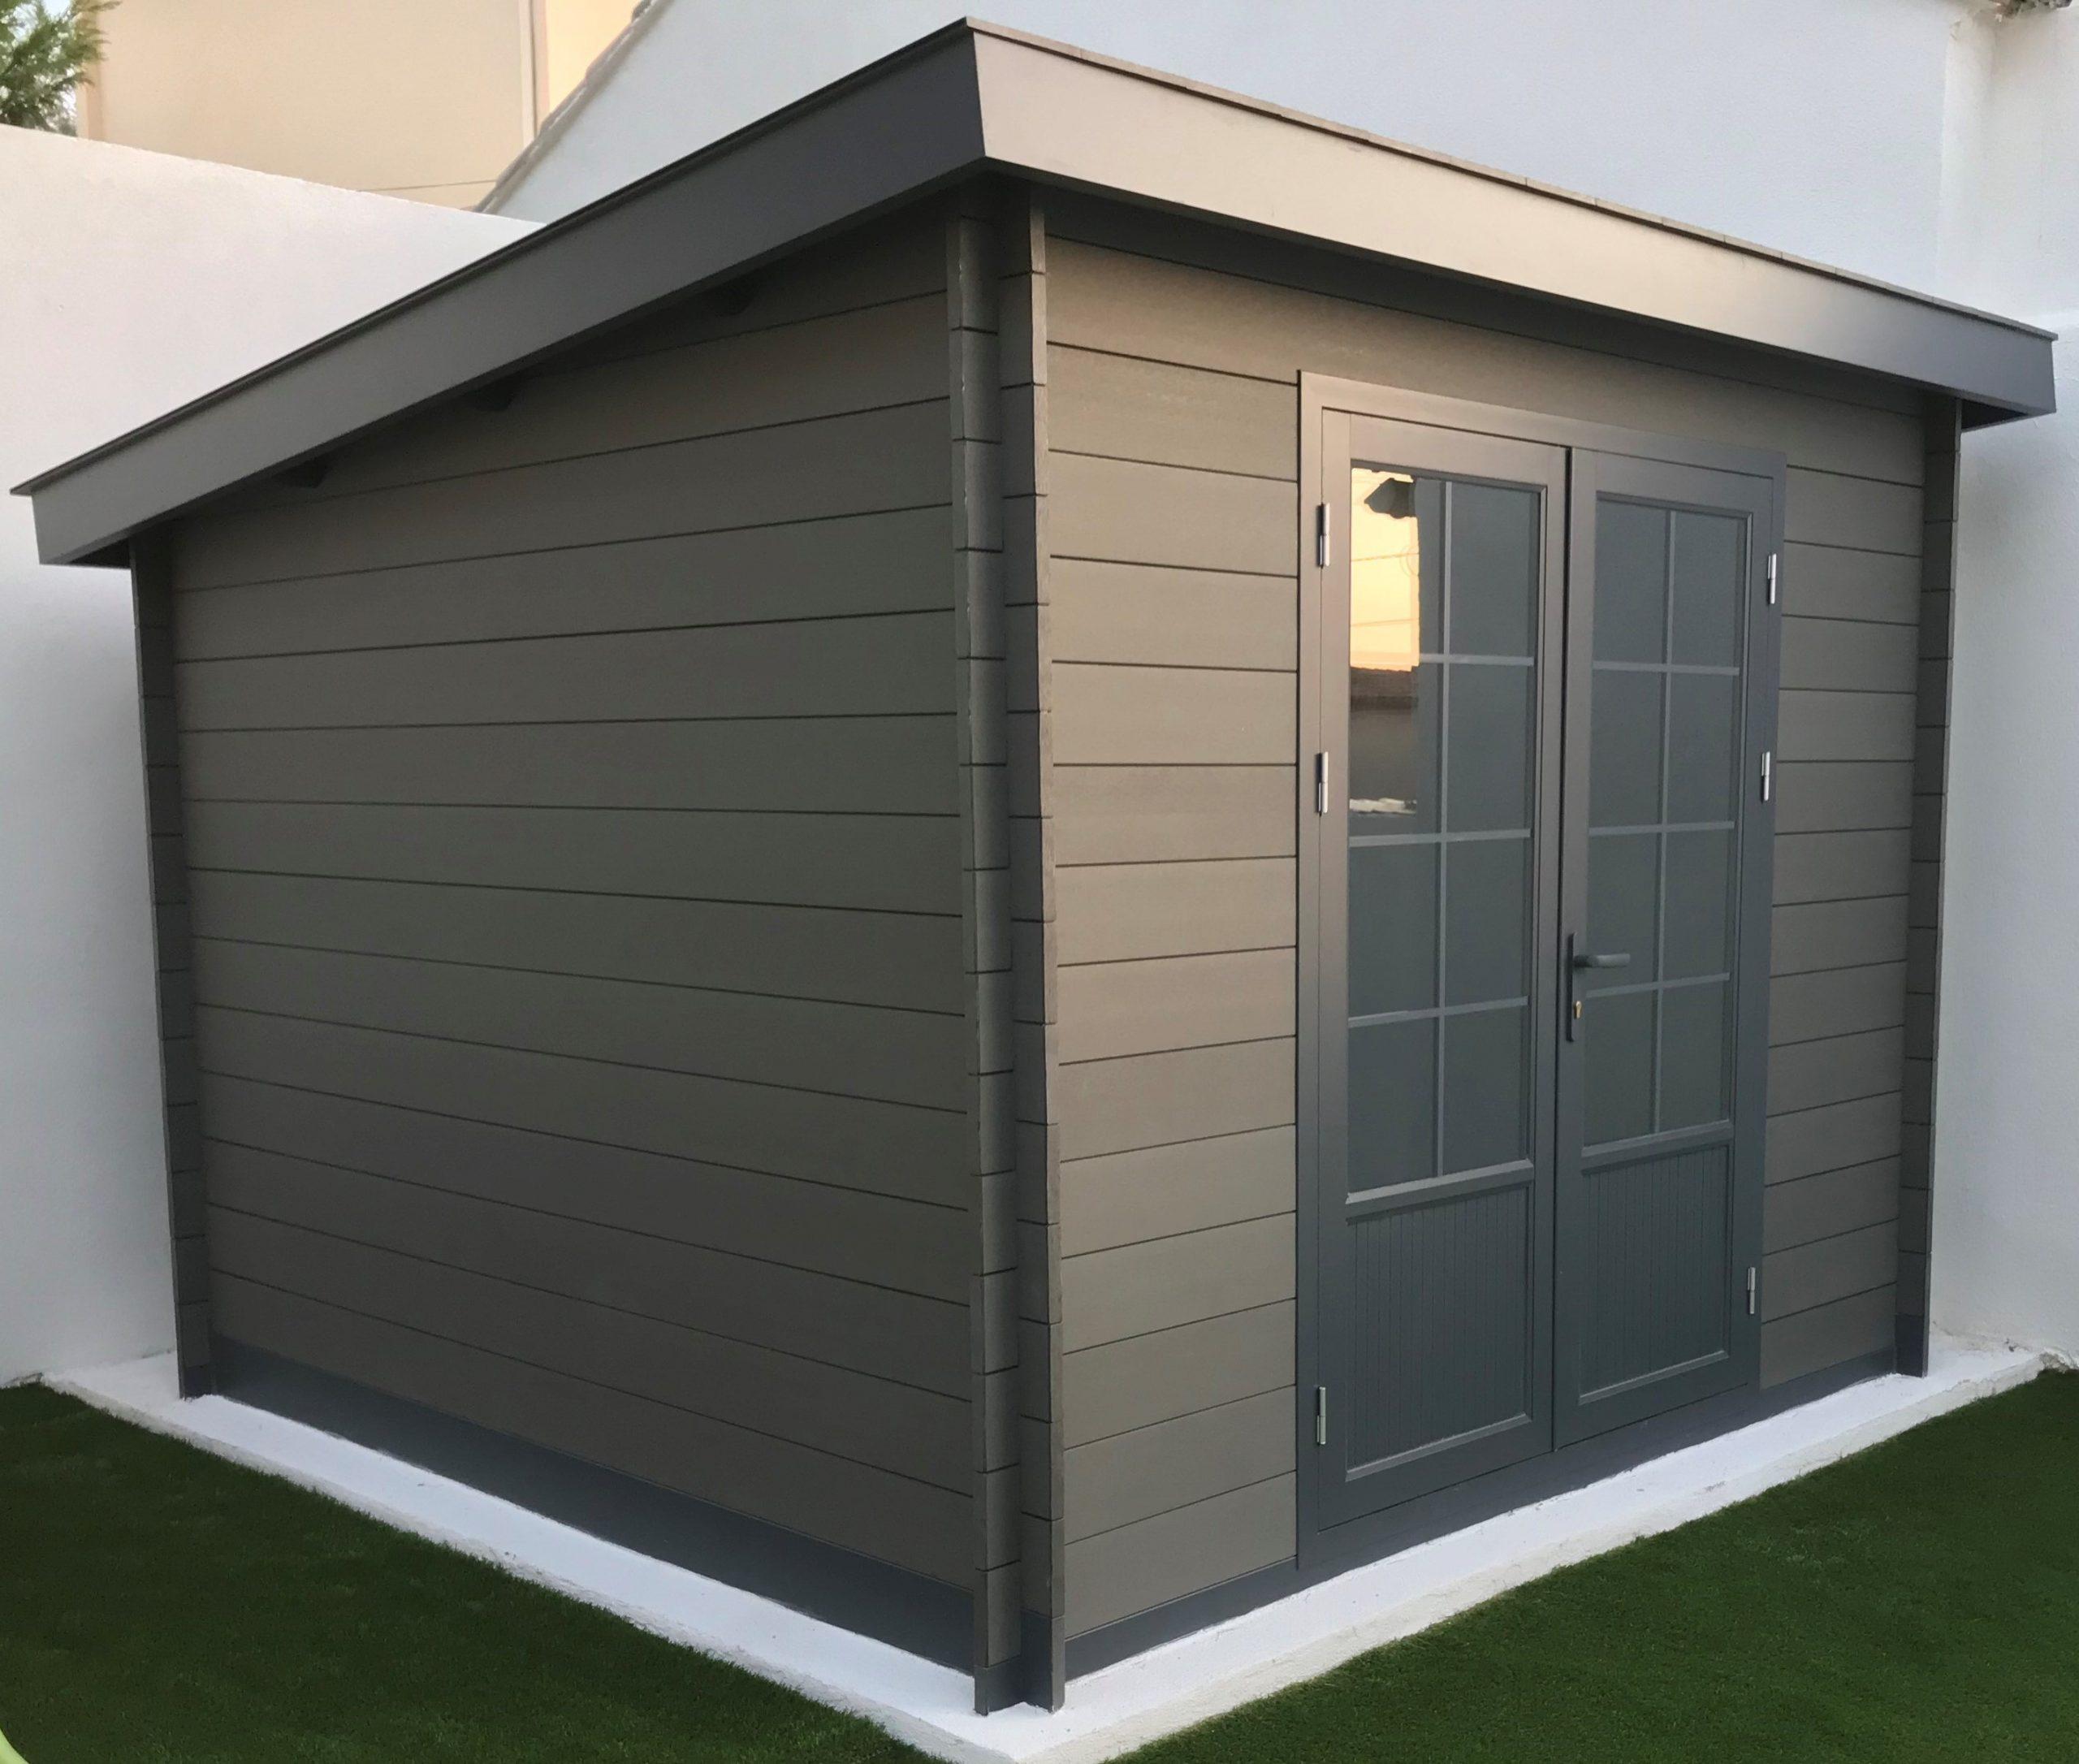 Abri Moderne 3×3 Toit Monopente – Green Outside encequiconcerne Abri Jardin Monopente